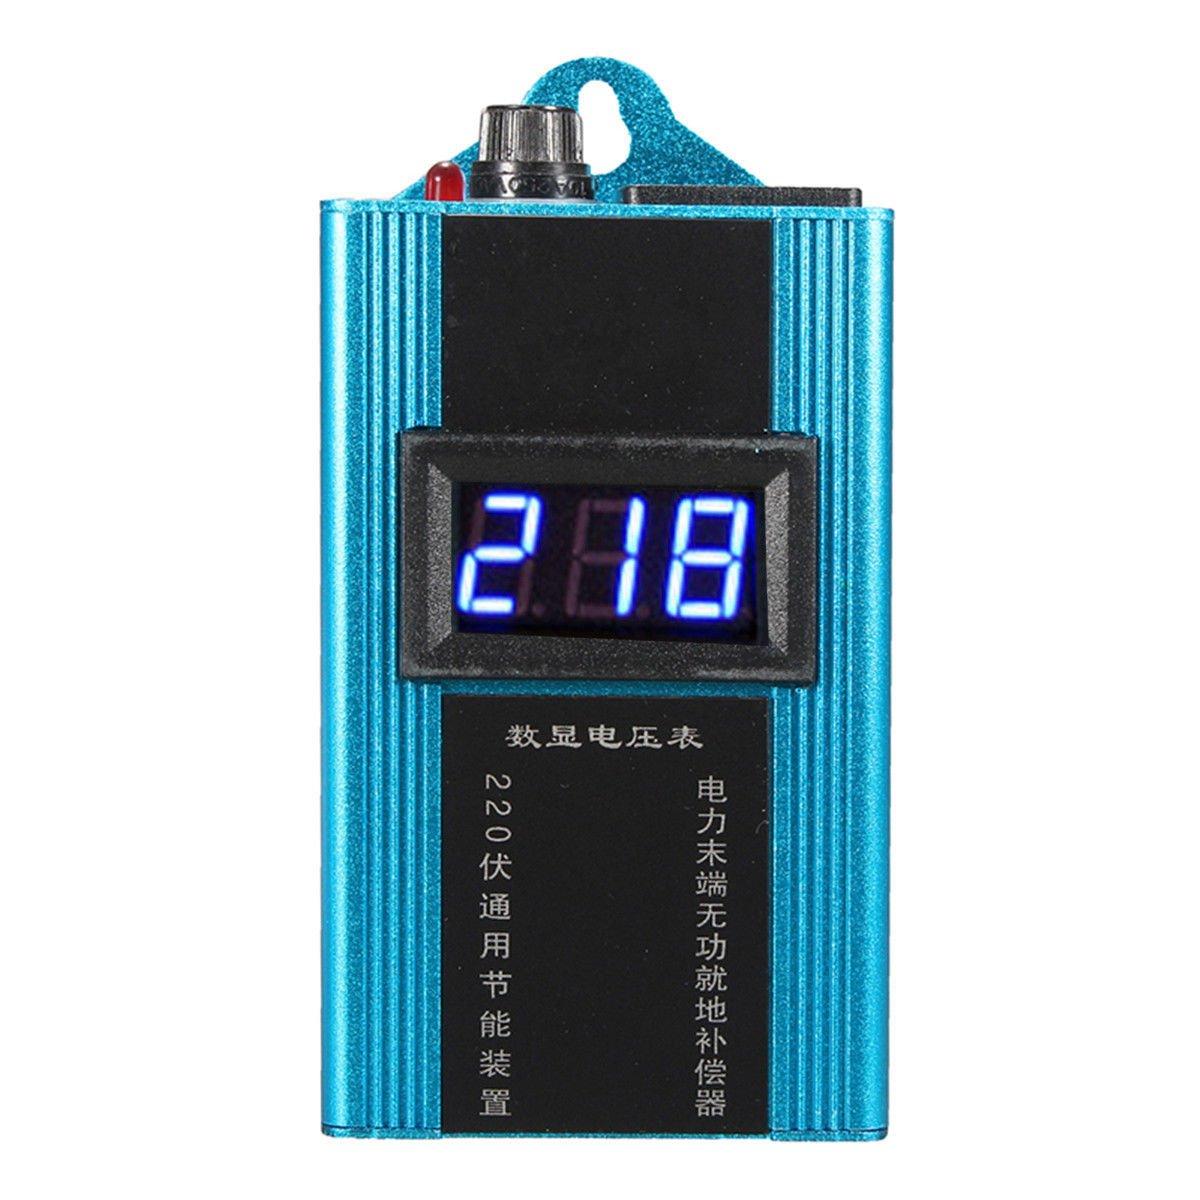 Simply Silver - Saver Saving Box Electricity - 110-230V 80KW 10-35% LED Power Energy Saver Saving Box Electricity Bill Killer US